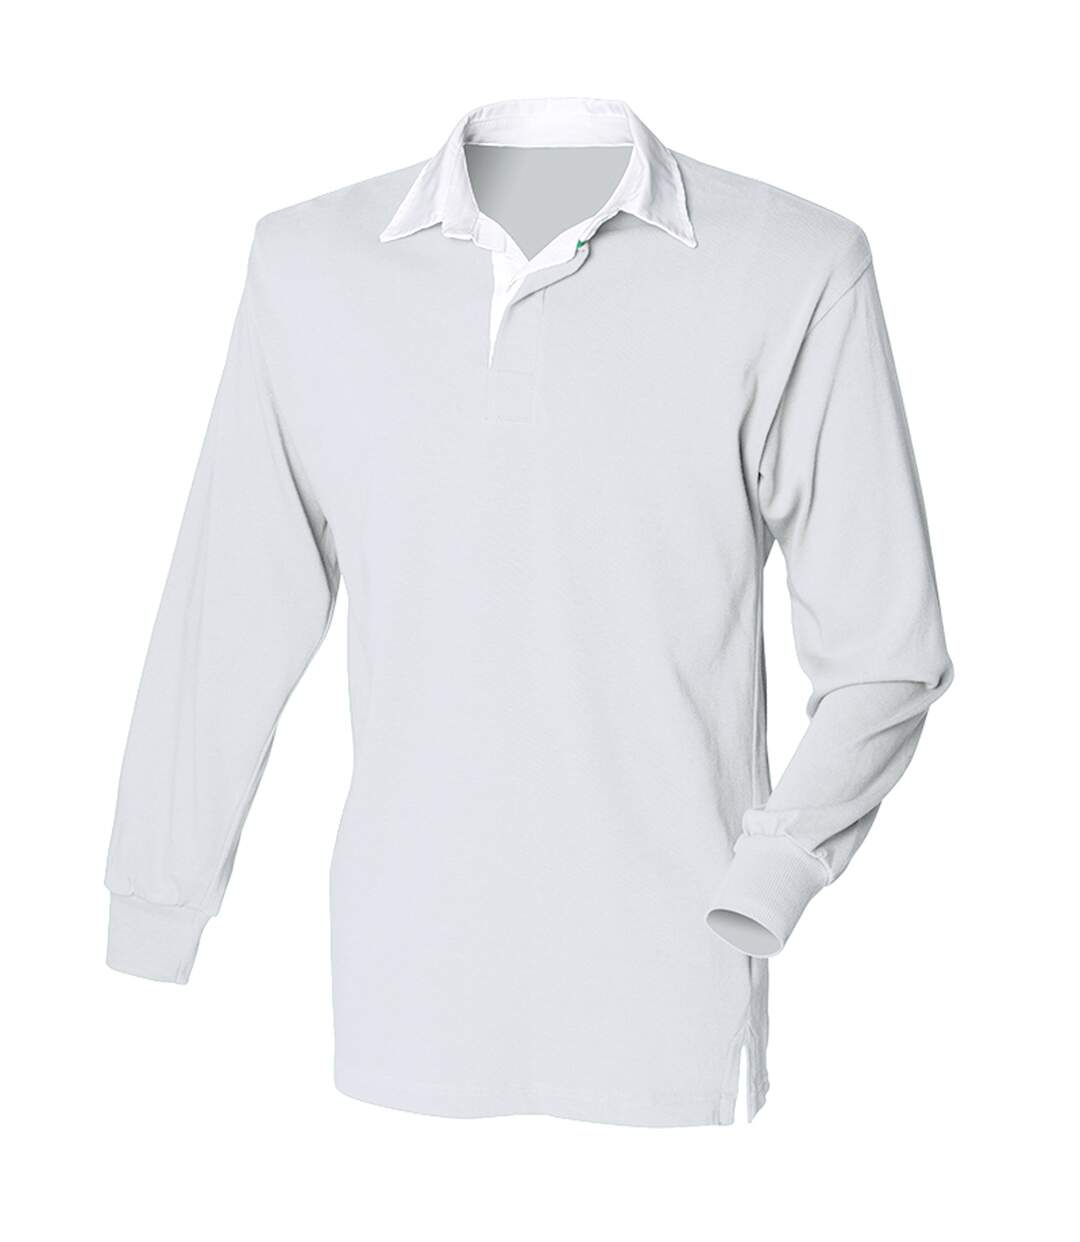 Front Row - Polo De Rugby À Manches Longues 100% Coton - Homme (Blanc/Blanc) - UTRW478